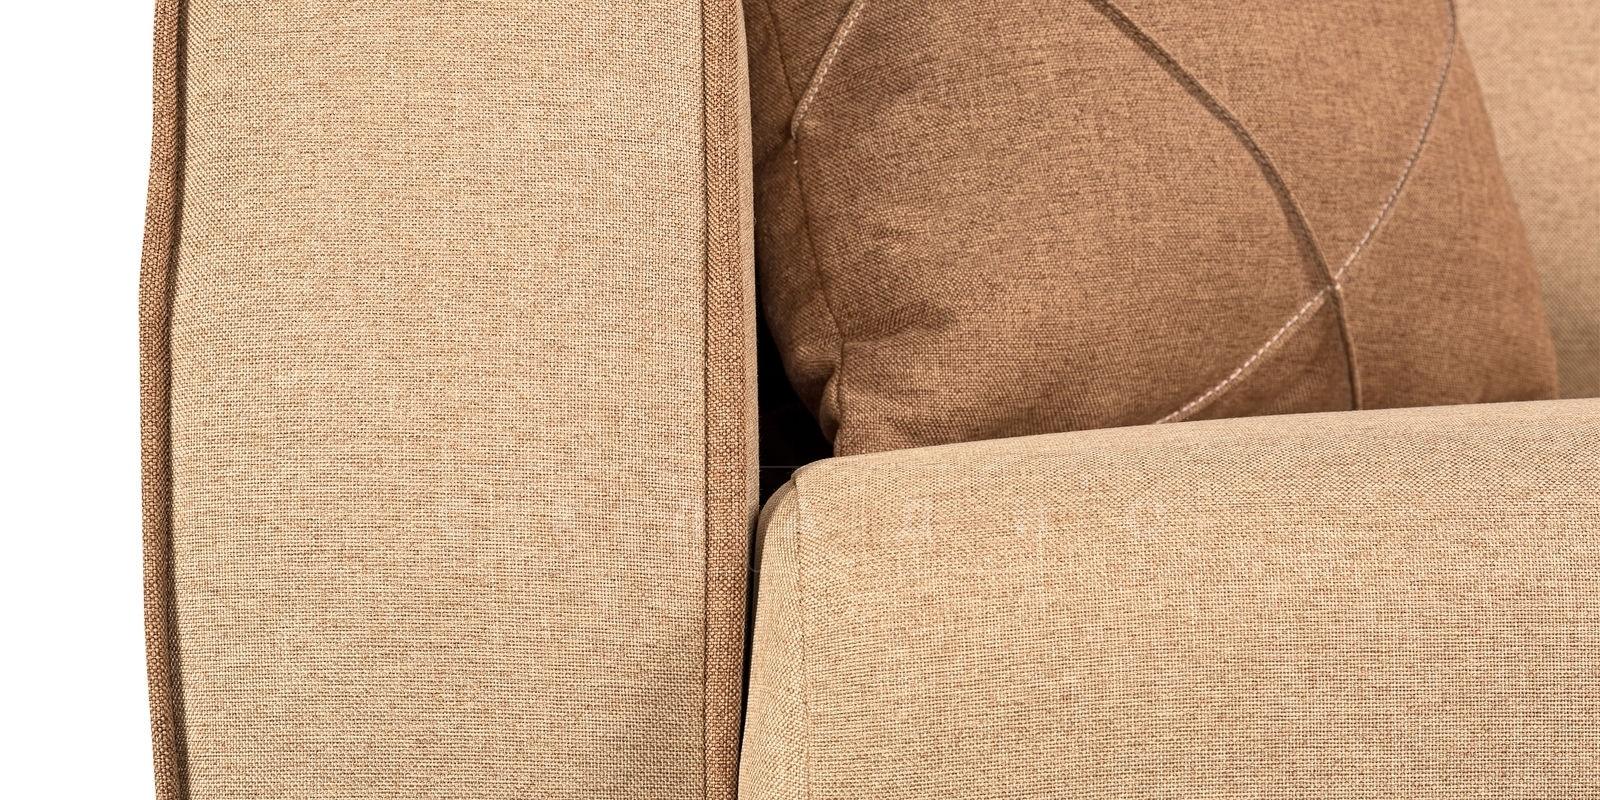 Диван Флэтфорд рогожка бежевый цвет фото 6 | интернет-магазин Складно